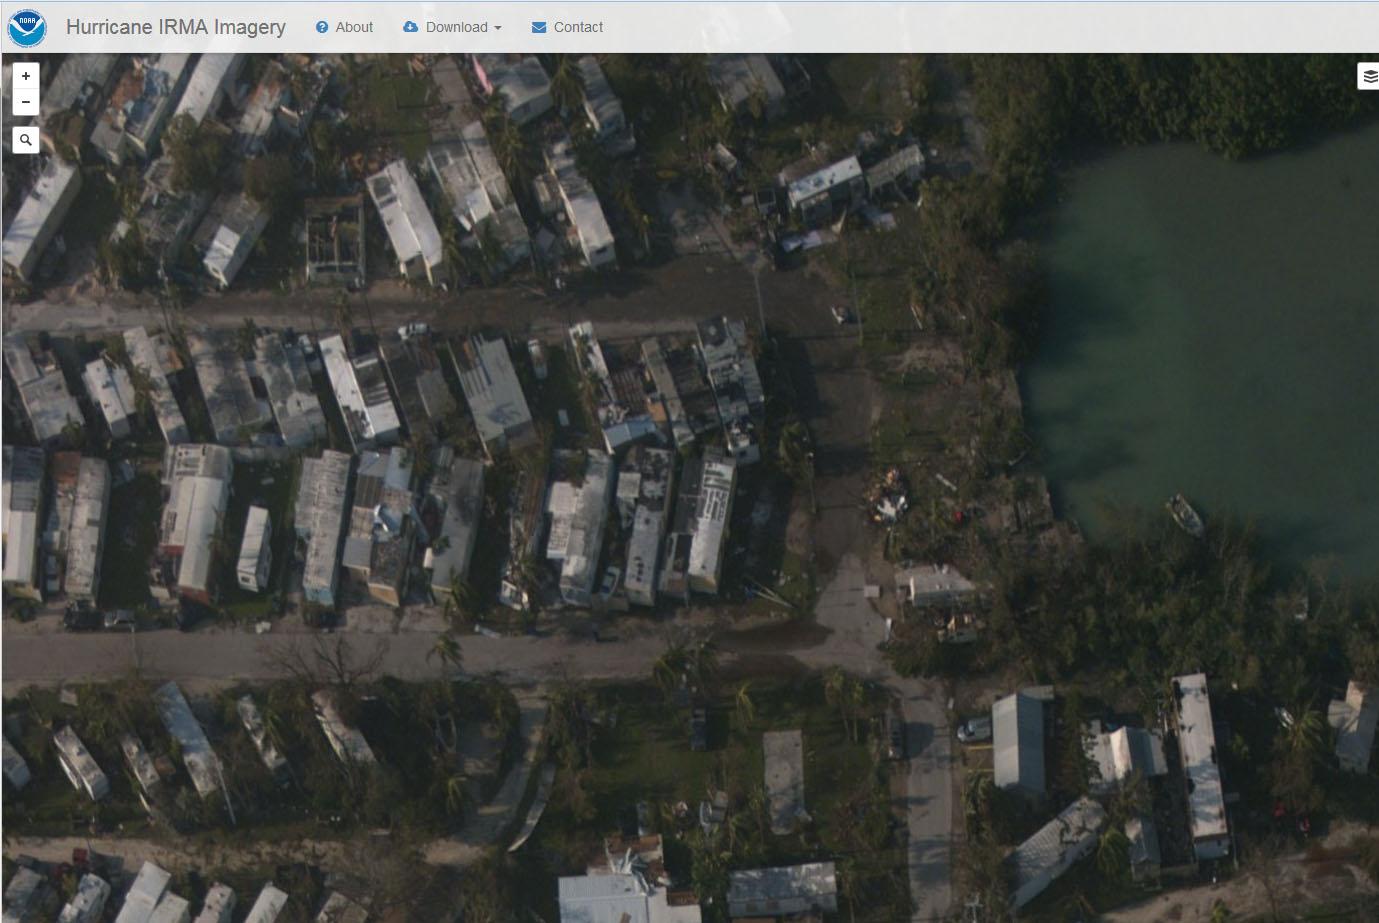 NOAA aerial aftermath Irma 3_409939